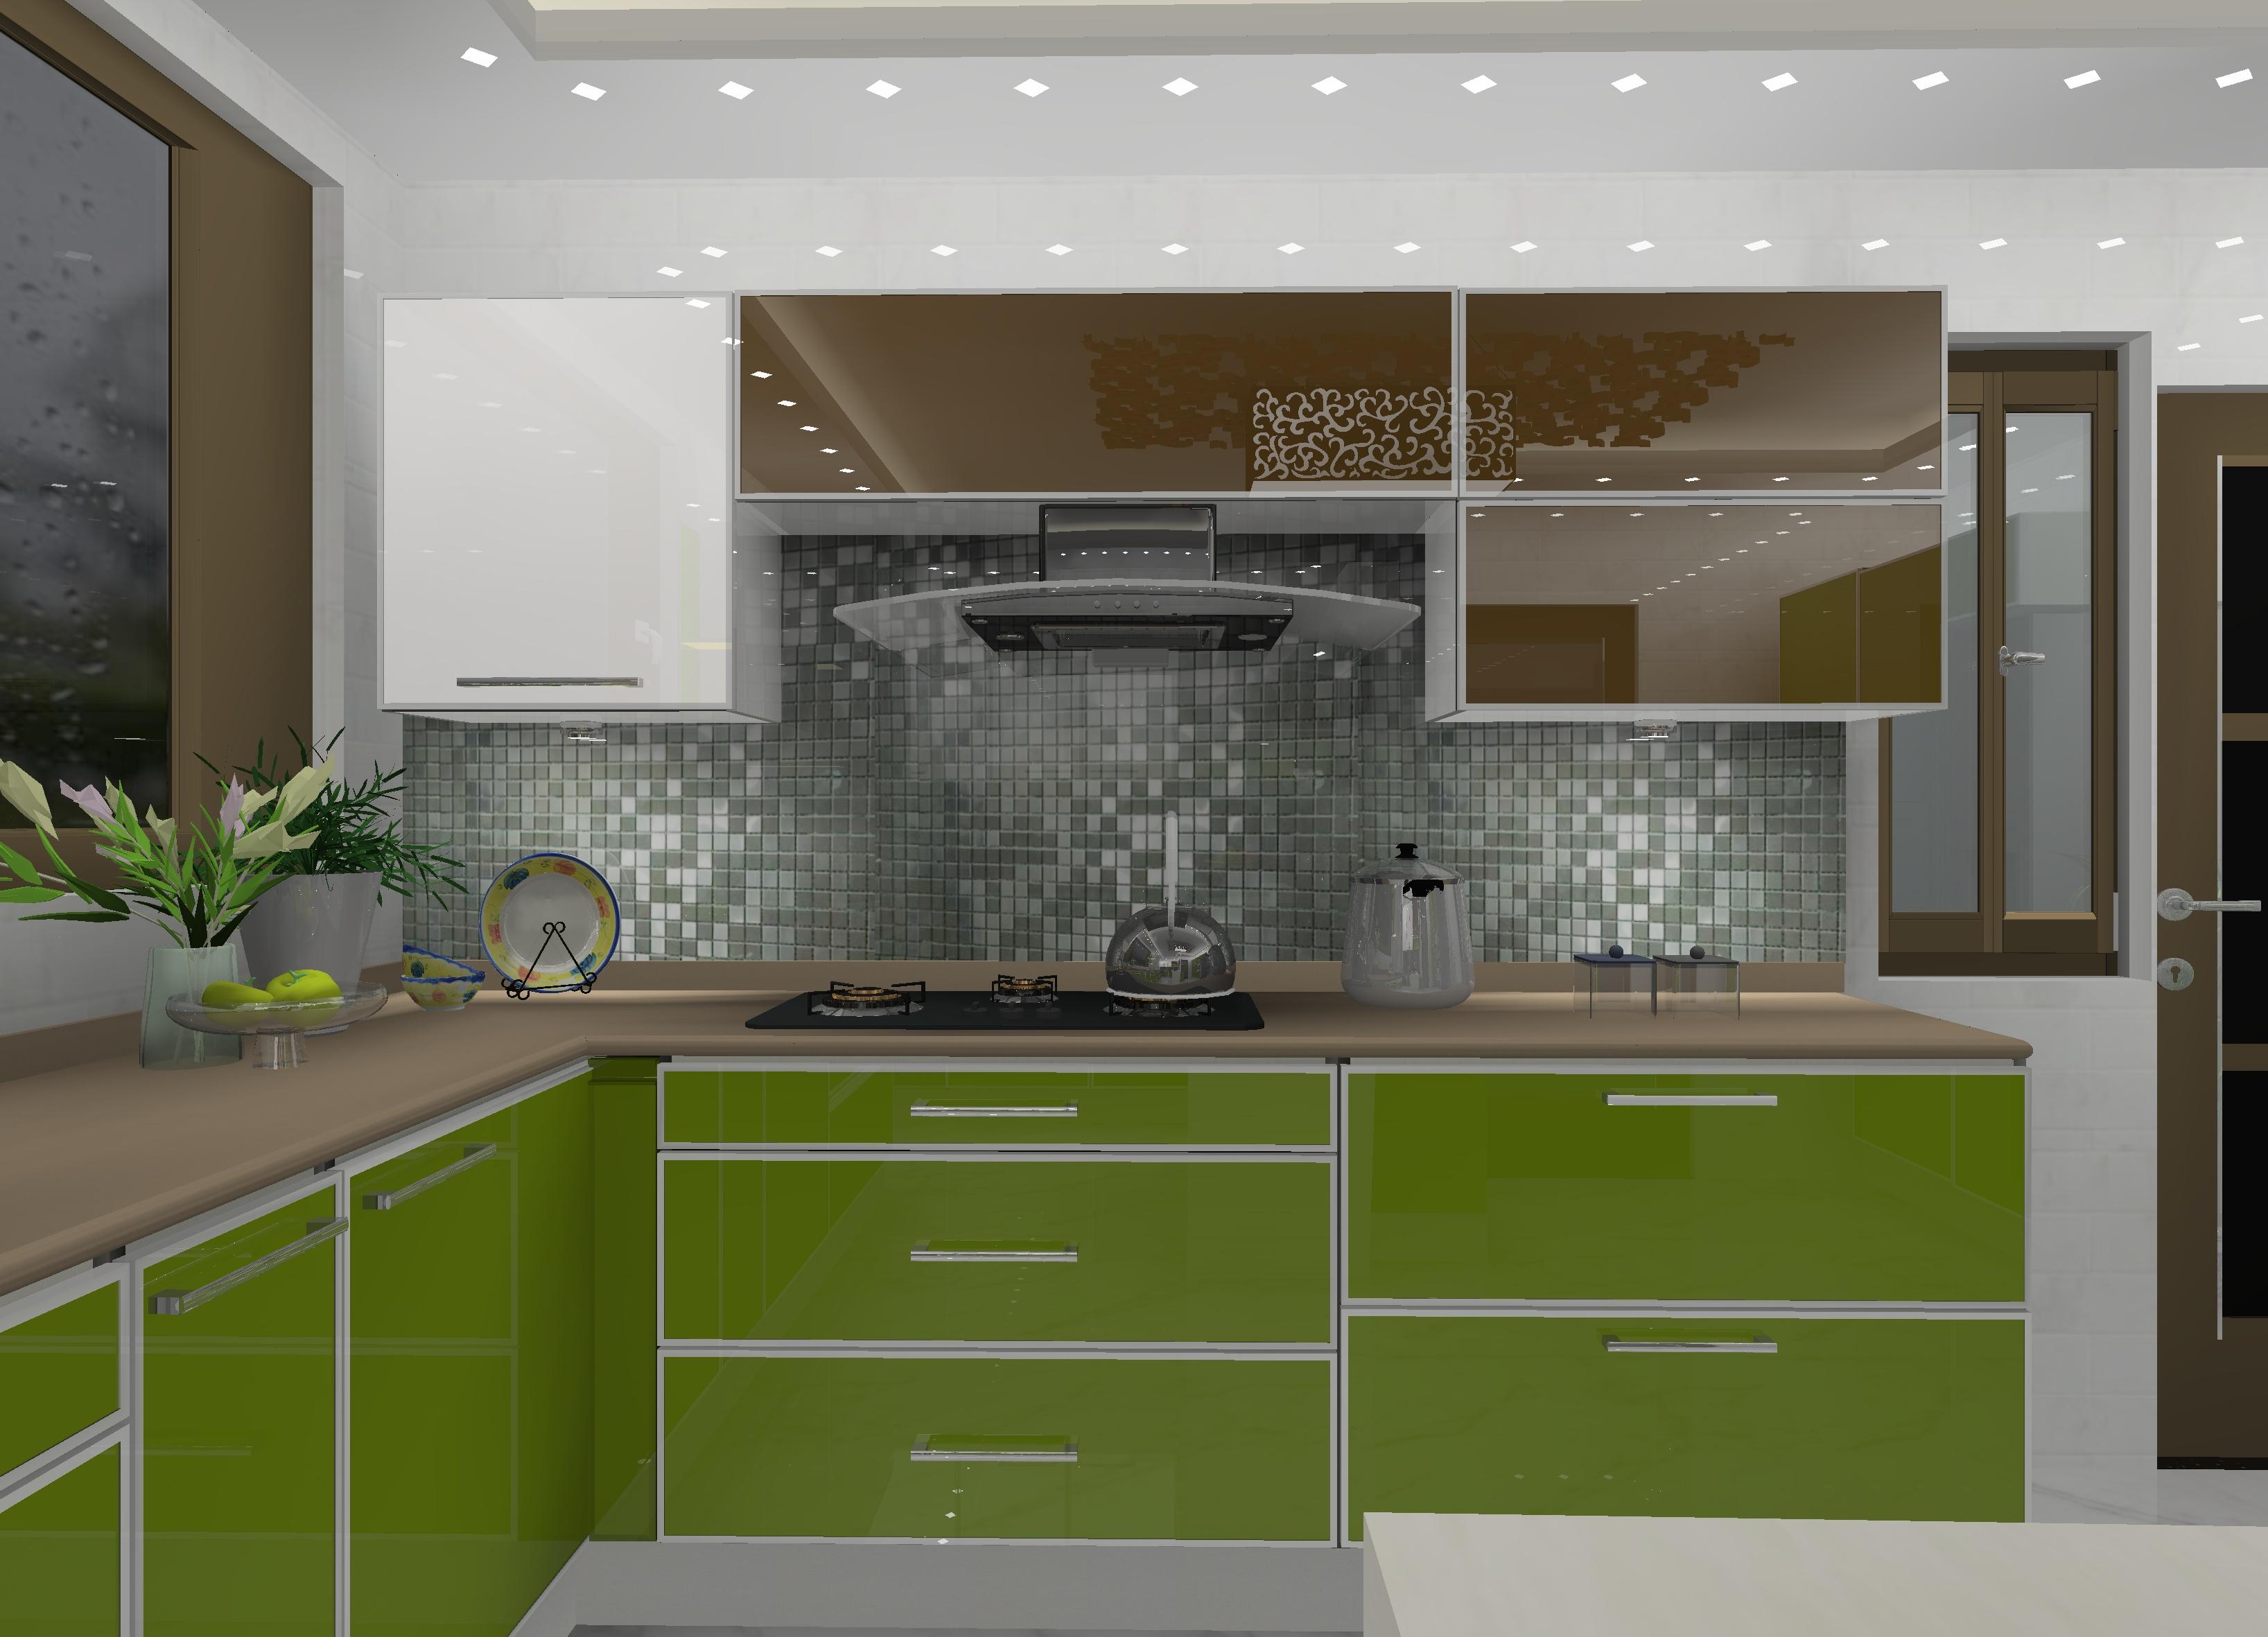 GCHFX - Kashmir - Zahoor - Ahmed - Ideas - Modular - Kitchens